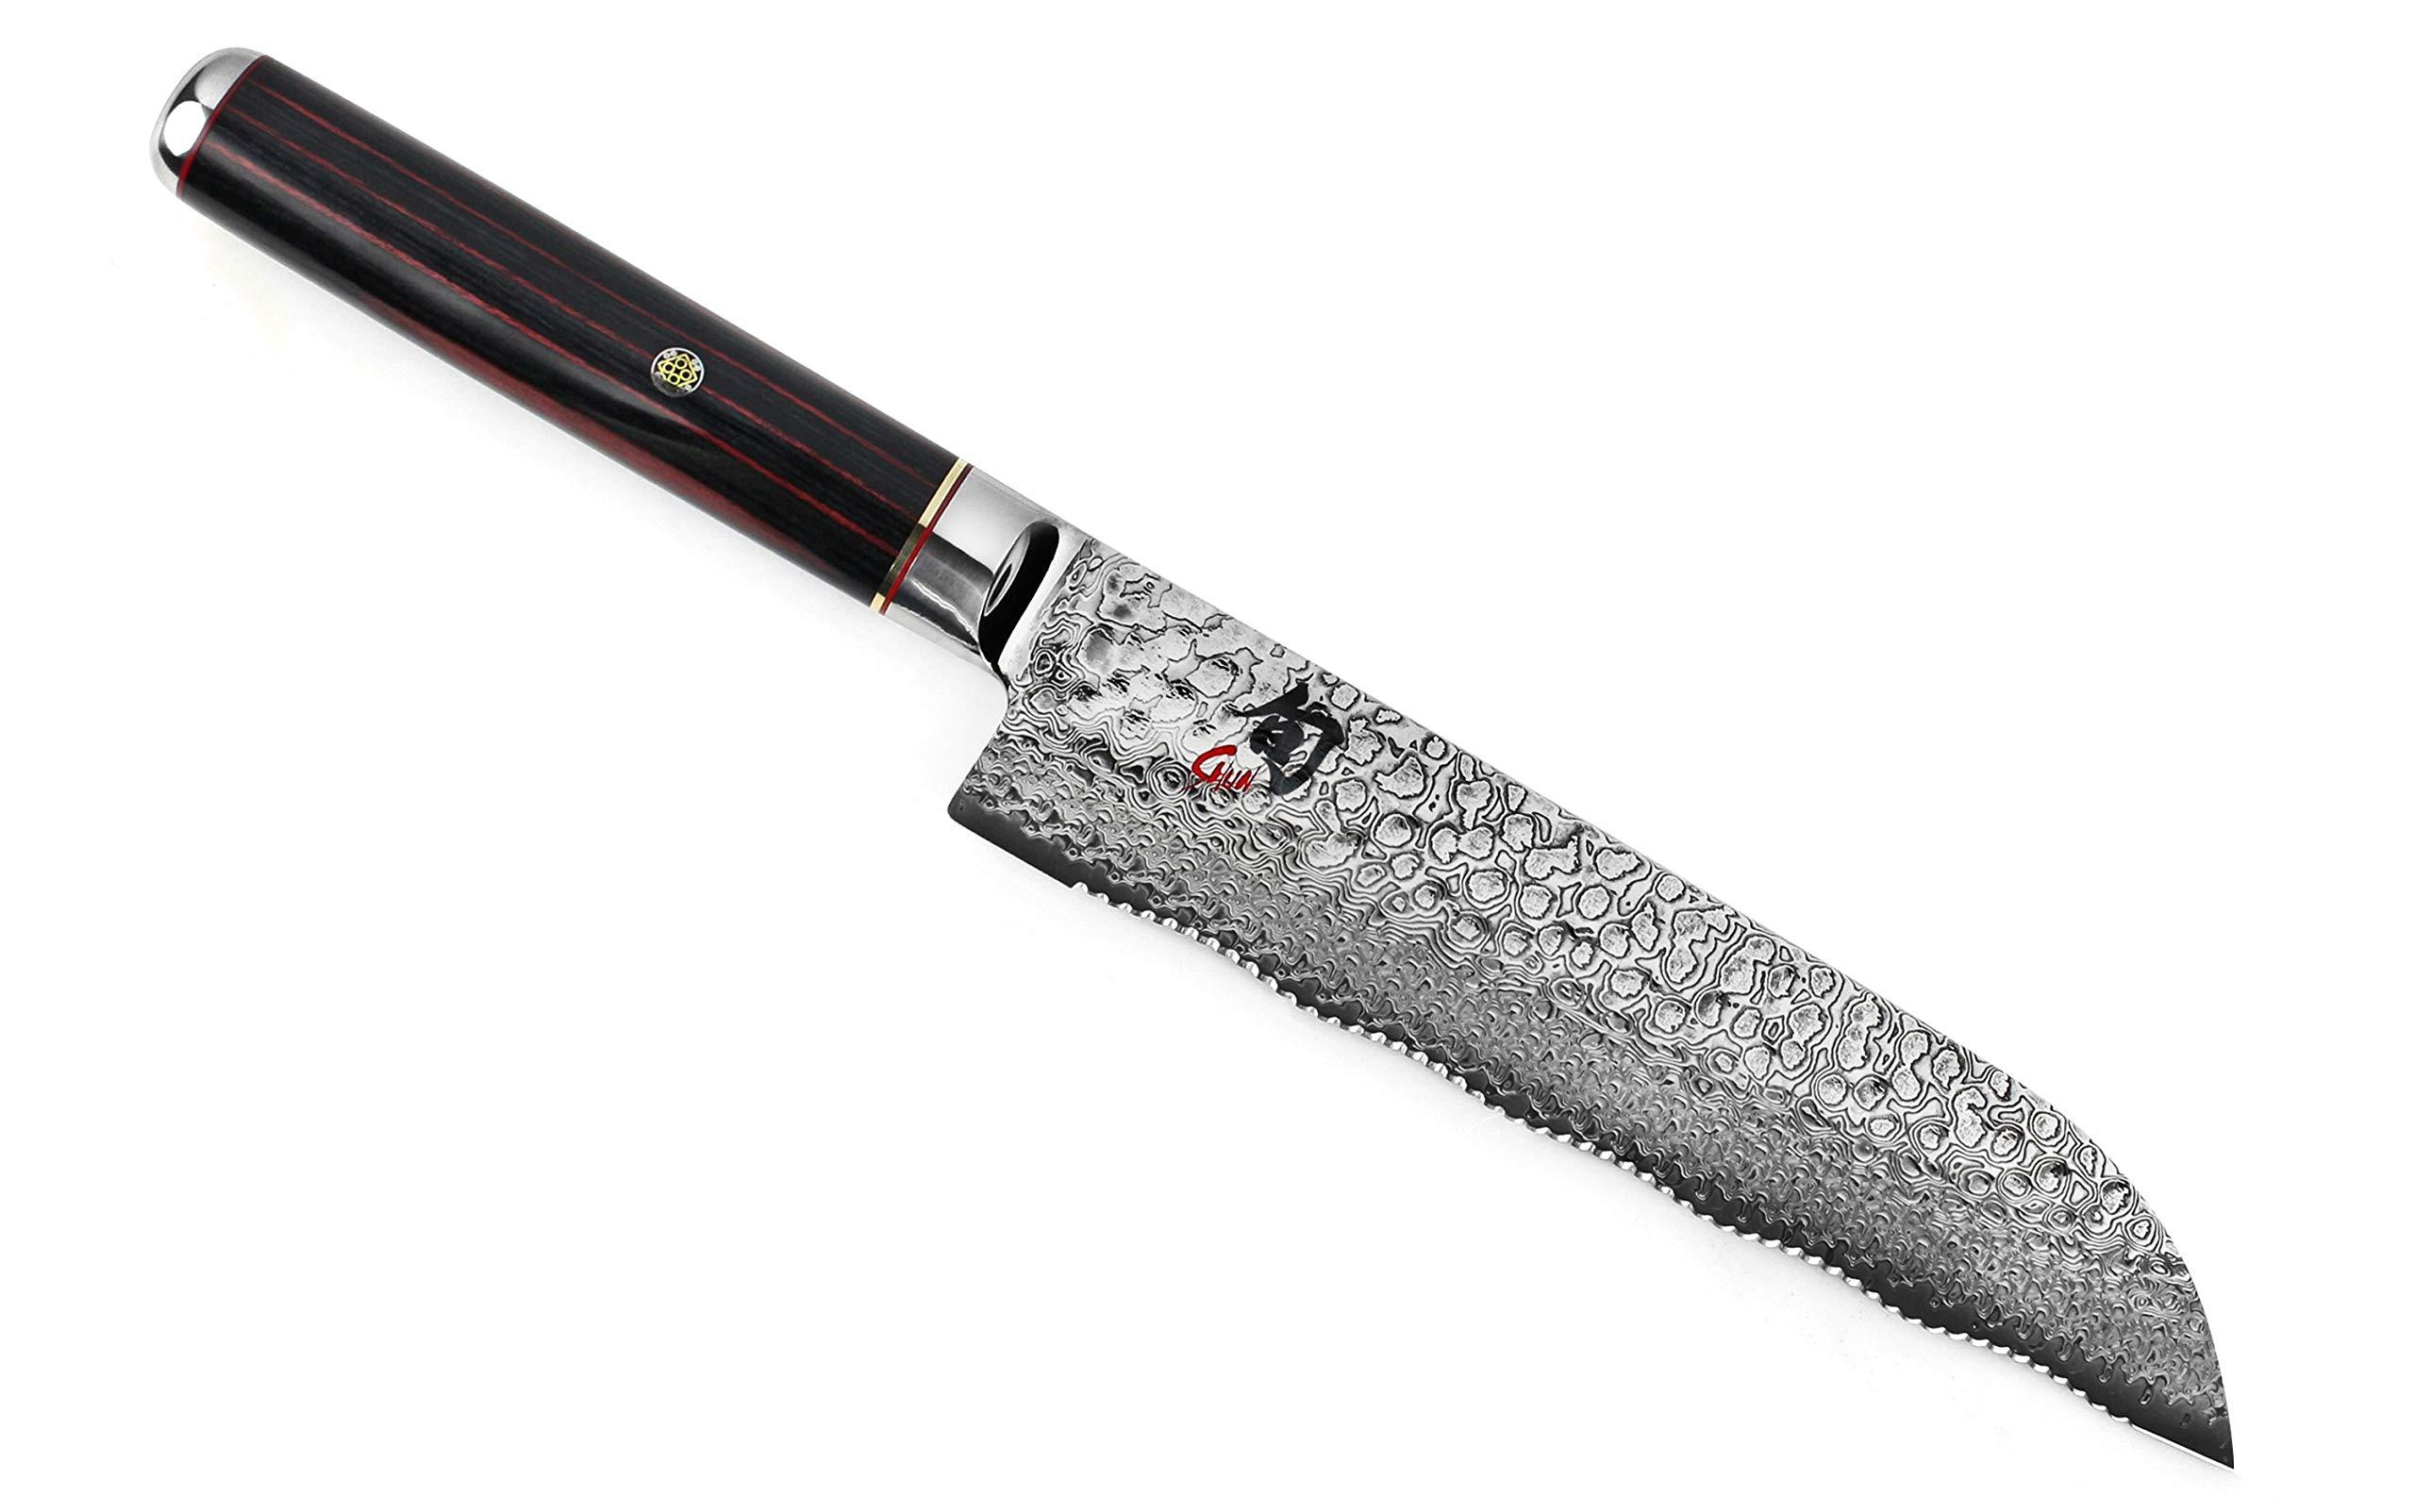 Shun Hiro SG2 7-inch Dual Density Serrated Utility Knife by Shun